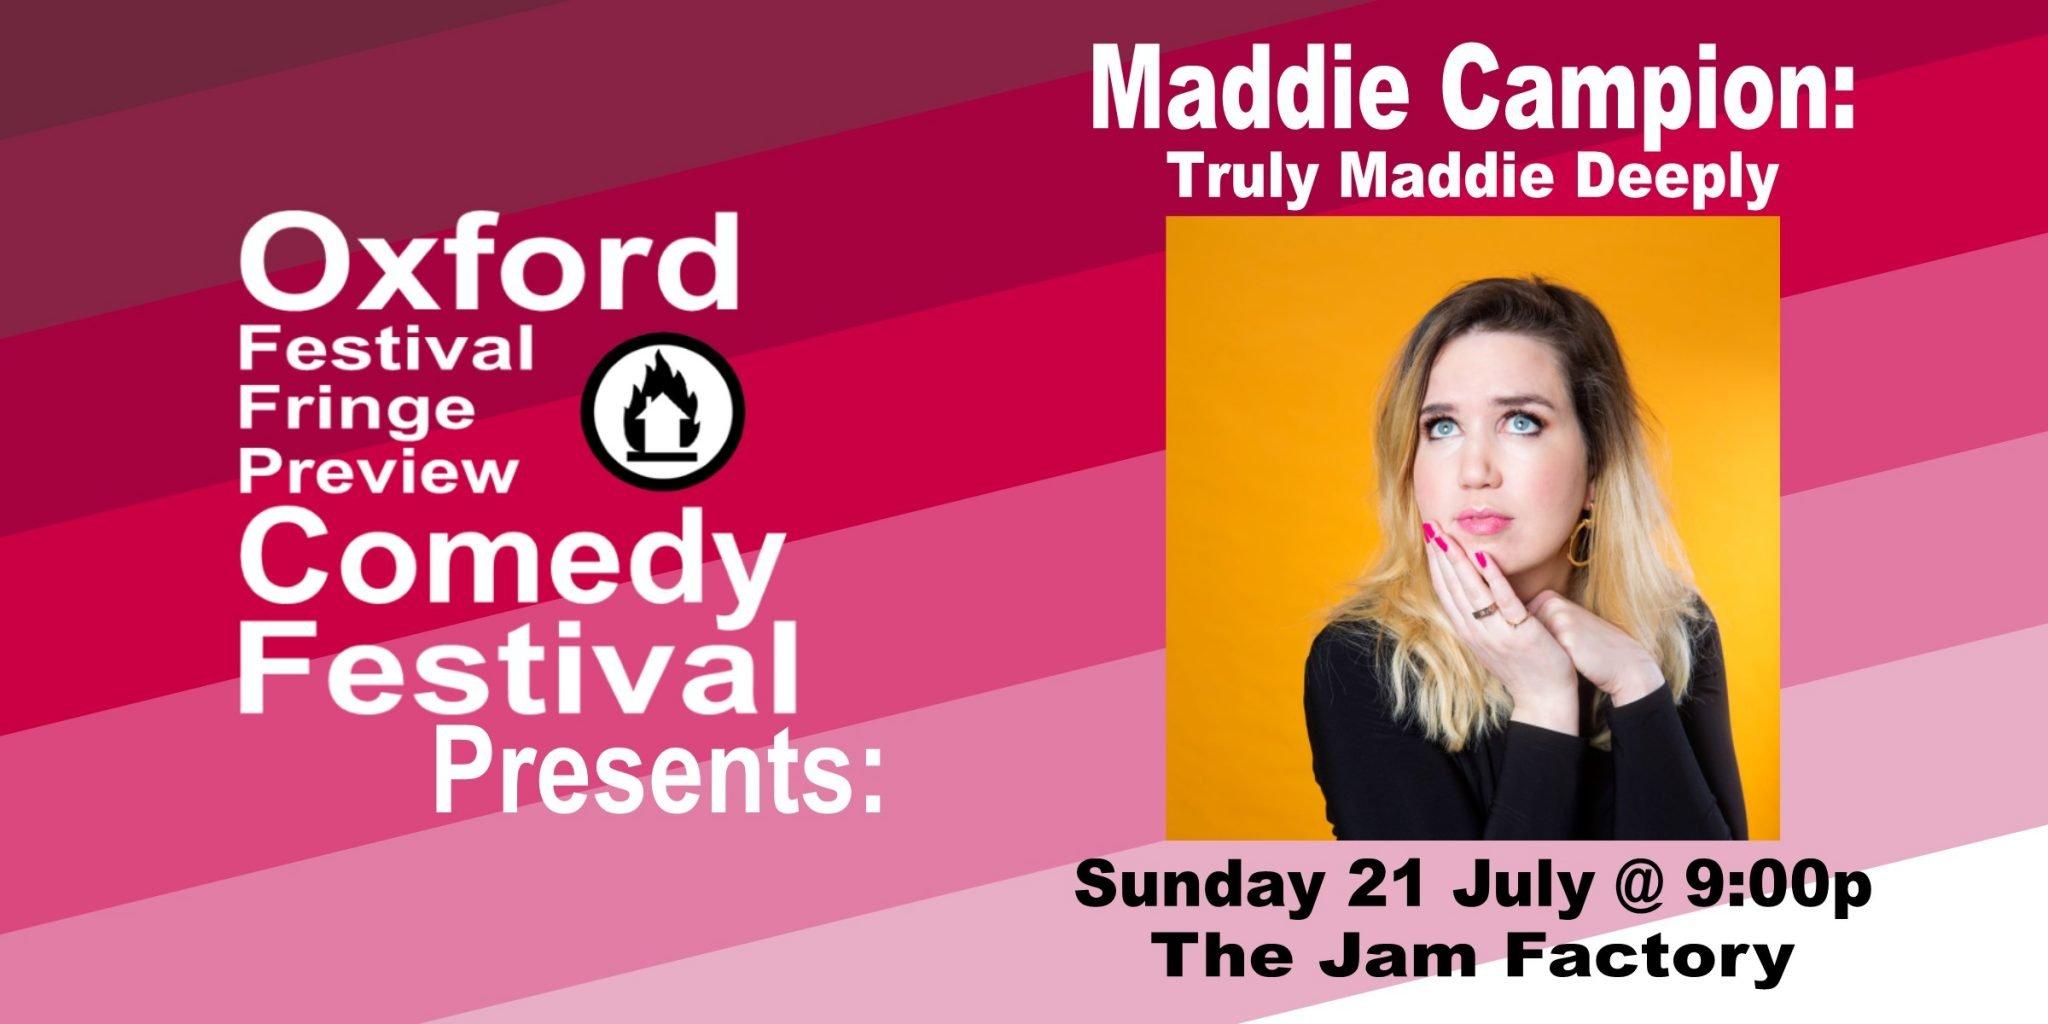 Oxford Comedy Festival 2019 presents Maddie Campion: Truly Maddie Deeply